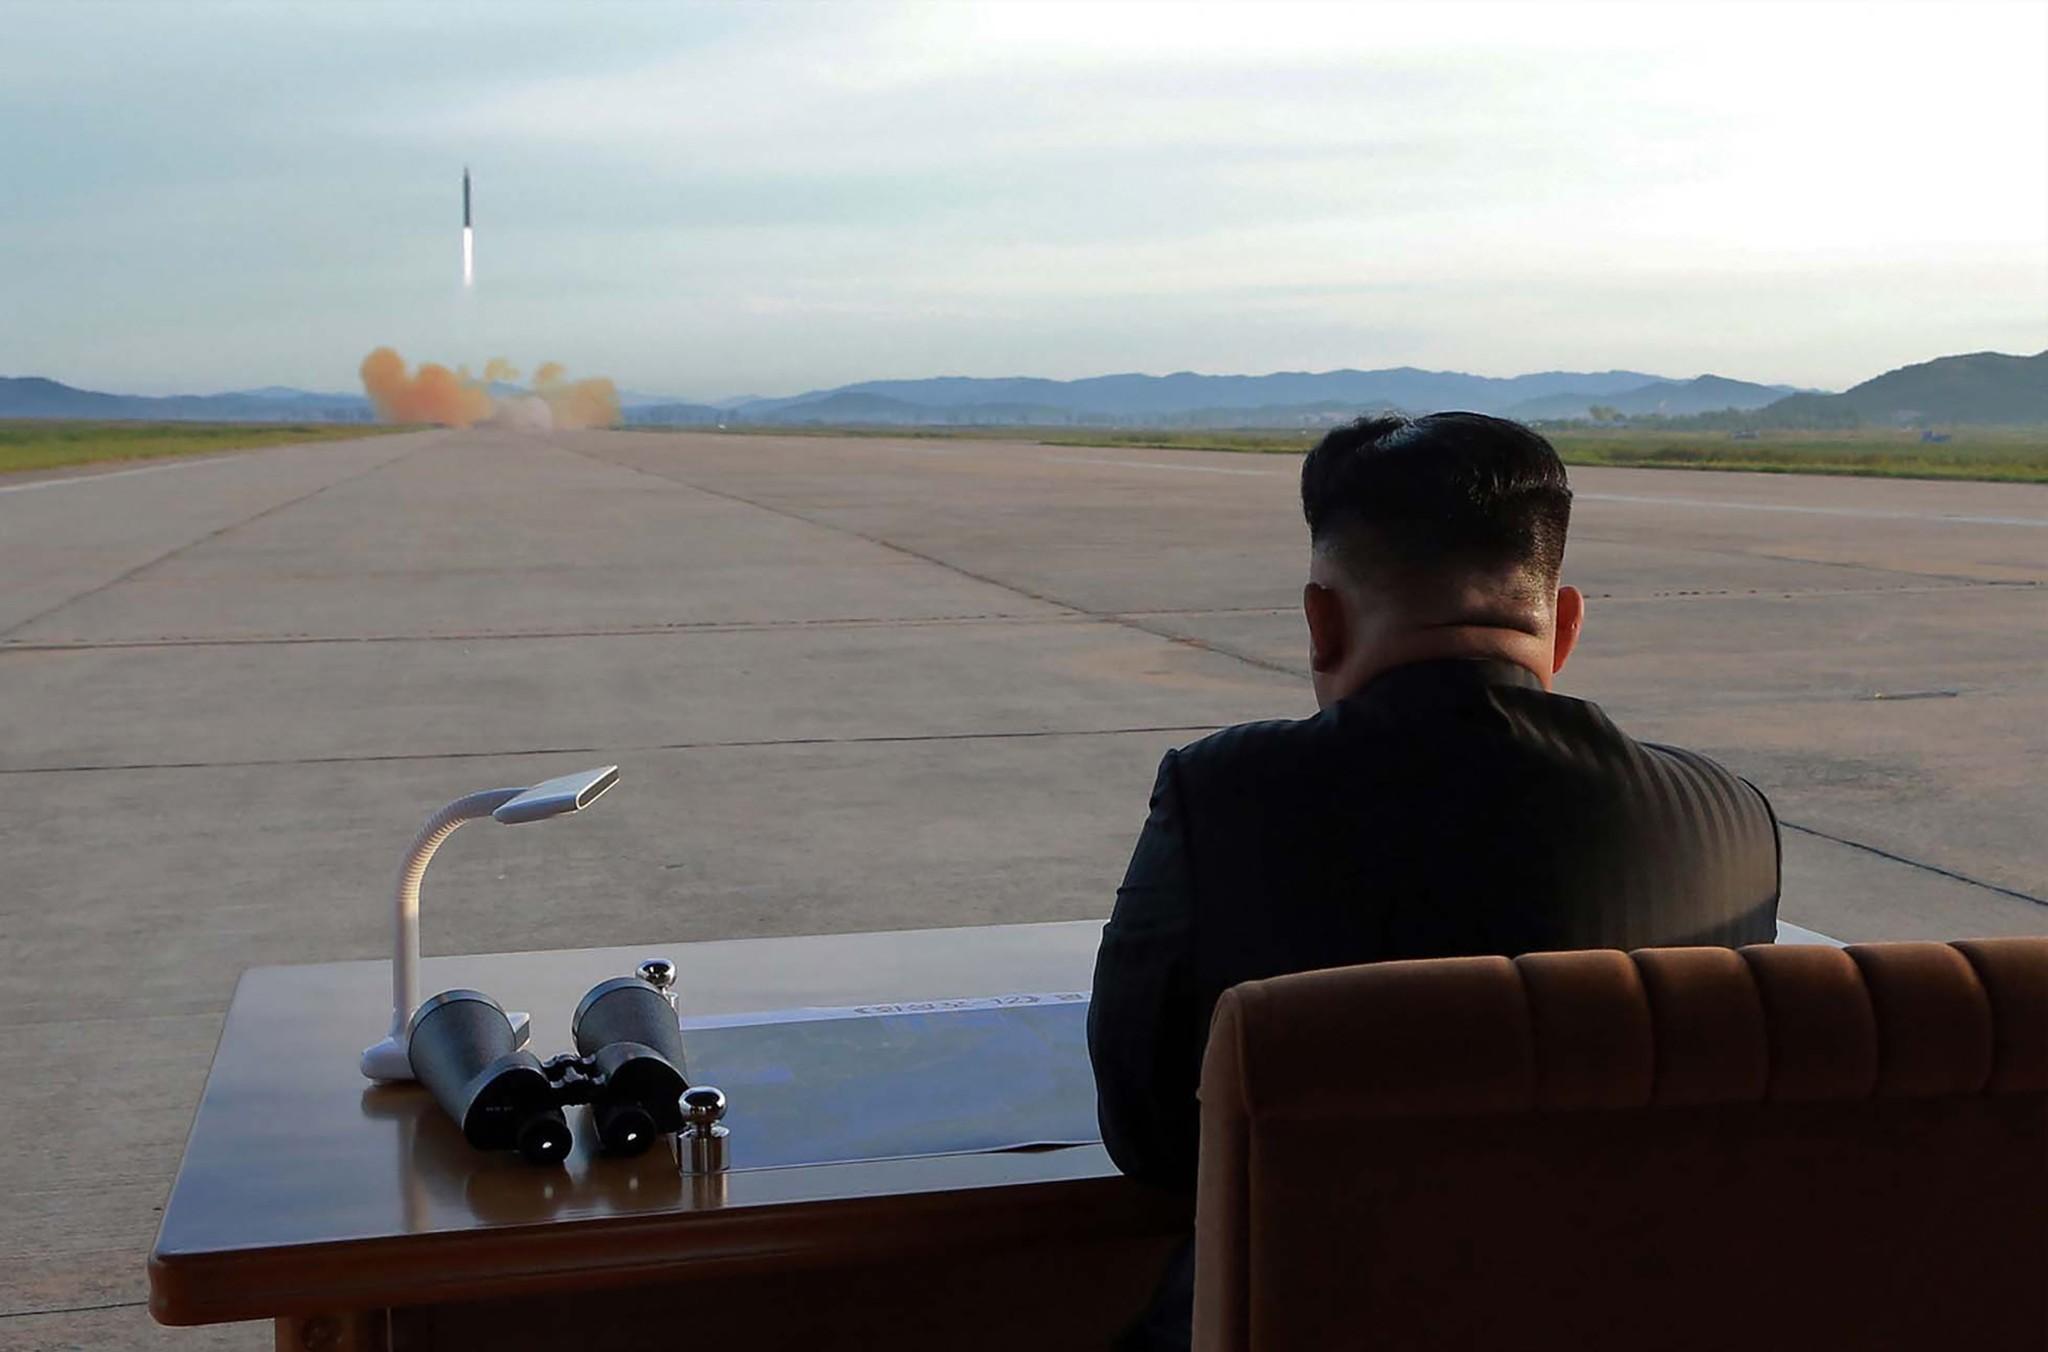 North Korean leader Kim Jong Un inspectes a launching drill of the medium-and-long range strategic ballistic rocket Hwasong-12 at an undisclosed location, Sept. 16.